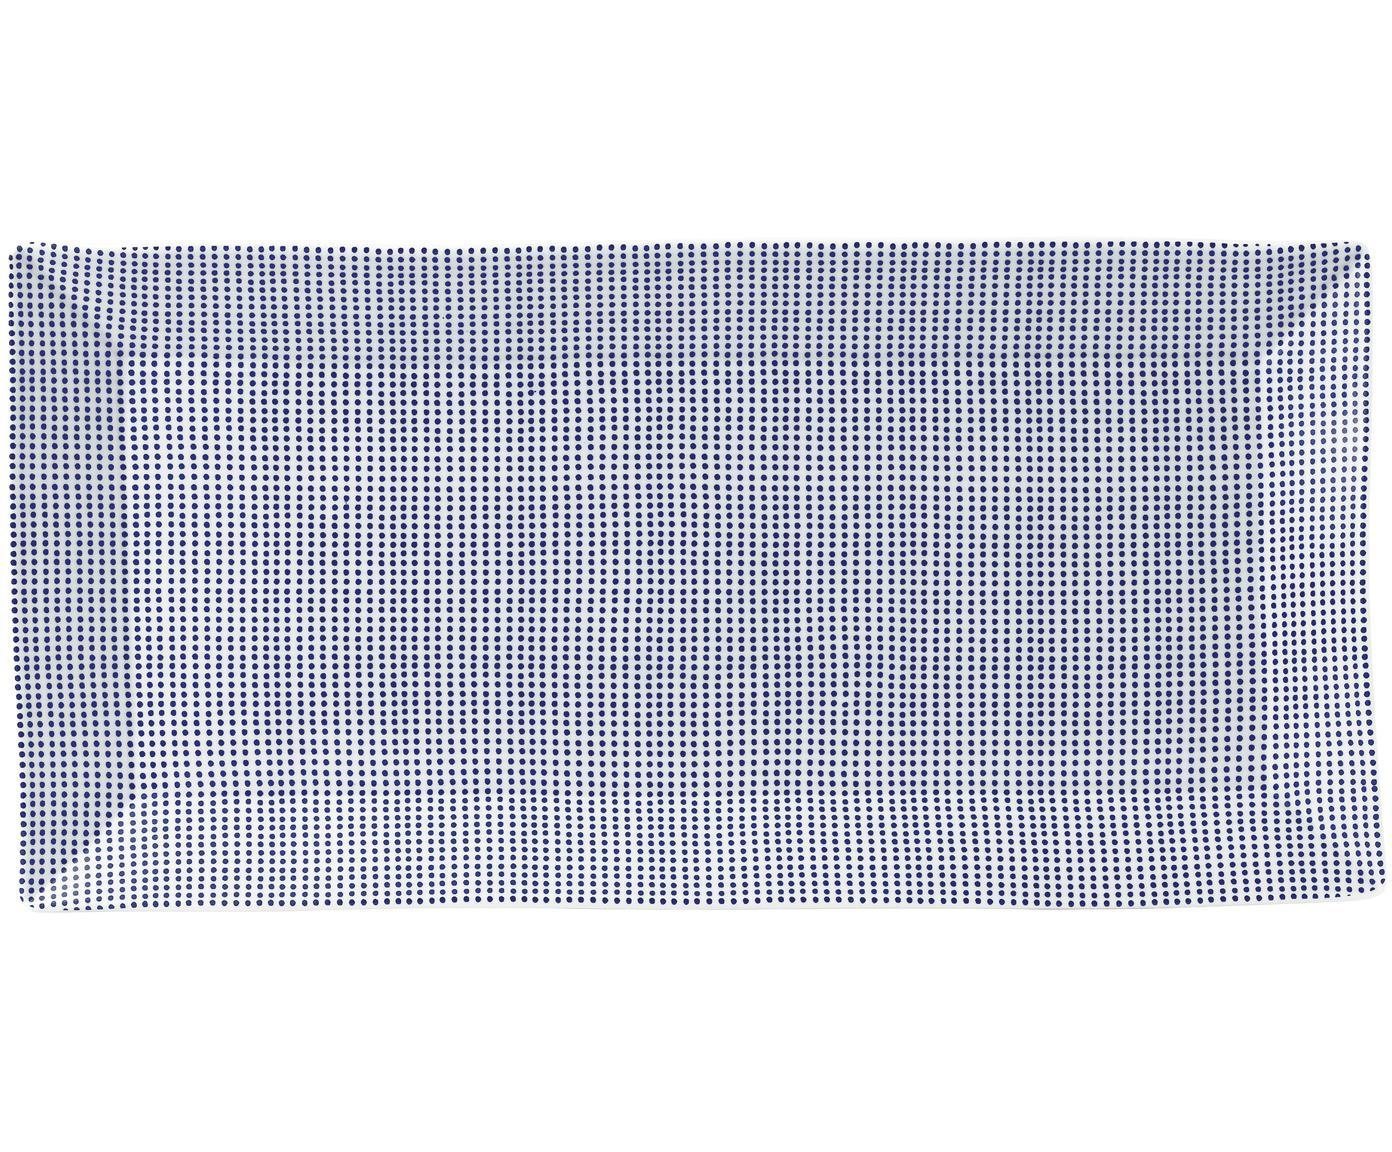 Półmisek Pacific, Porcelana, Biały, niebieski, D 39 x S 18 cm